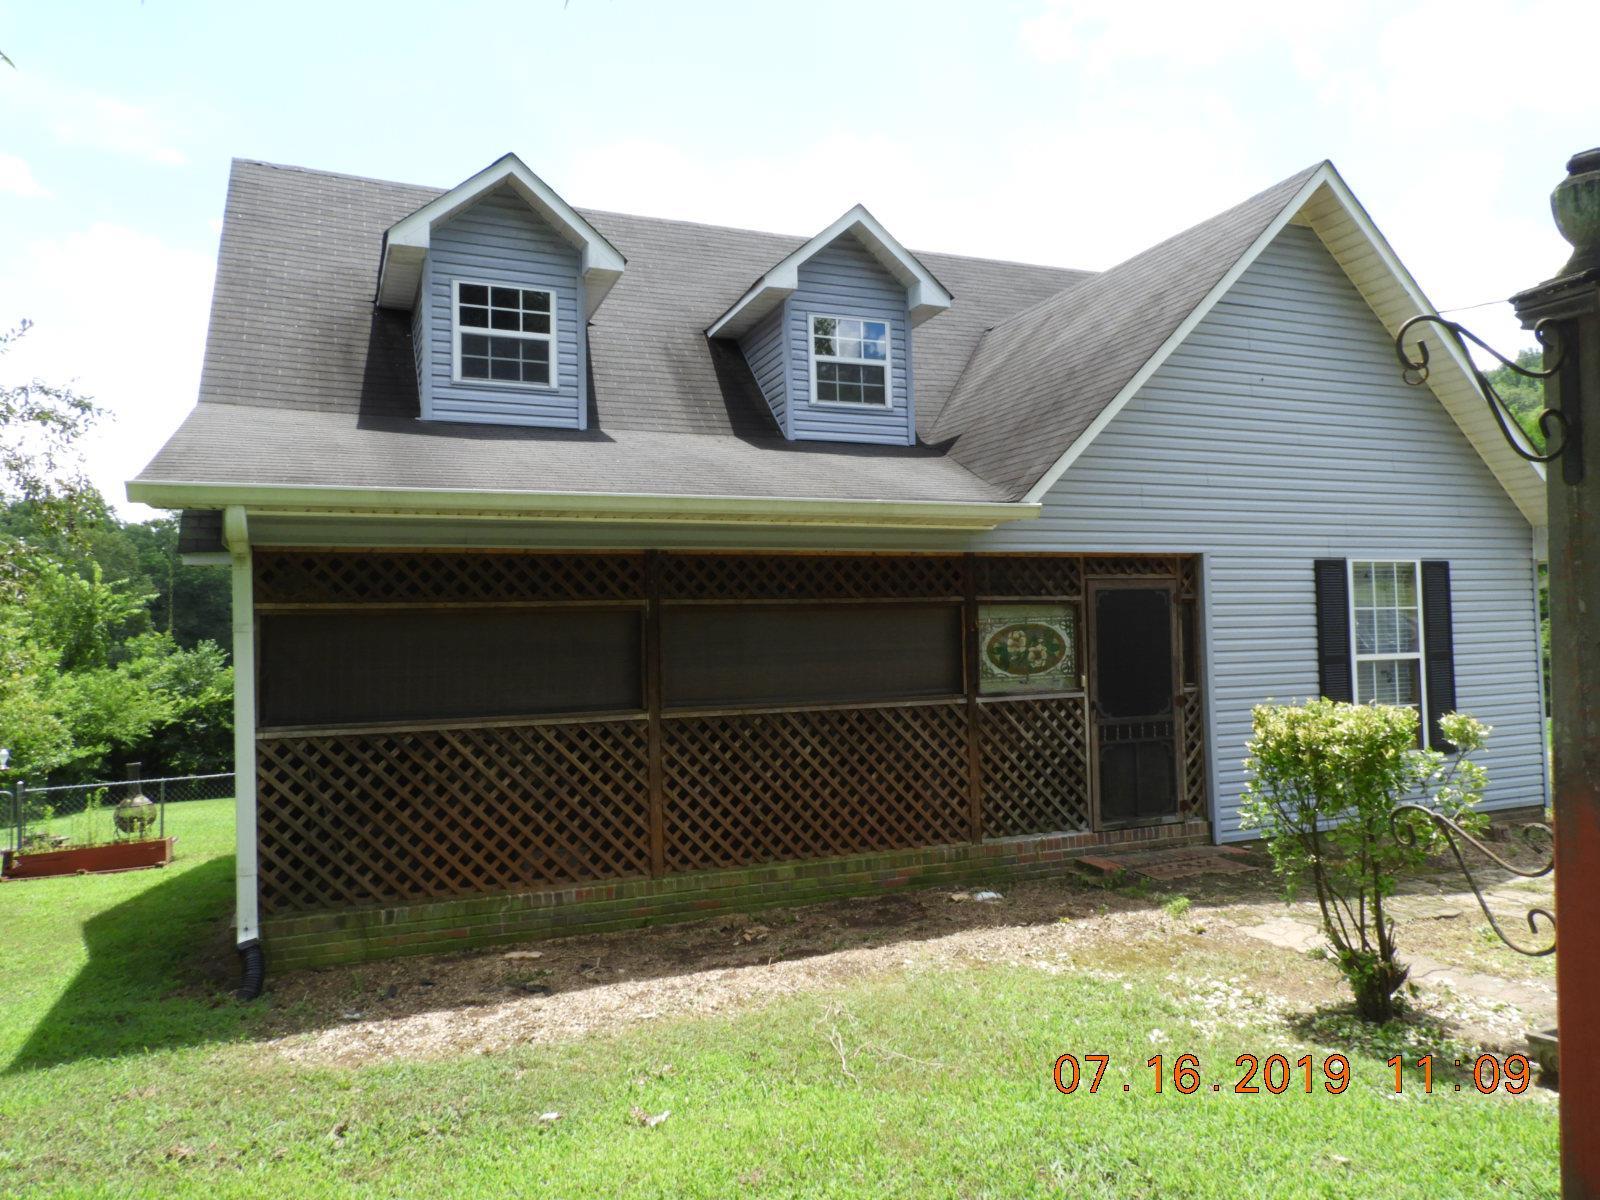 849 Hickory Dr, Pulaski, TN 38478 - Pulaski, TN real estate listing